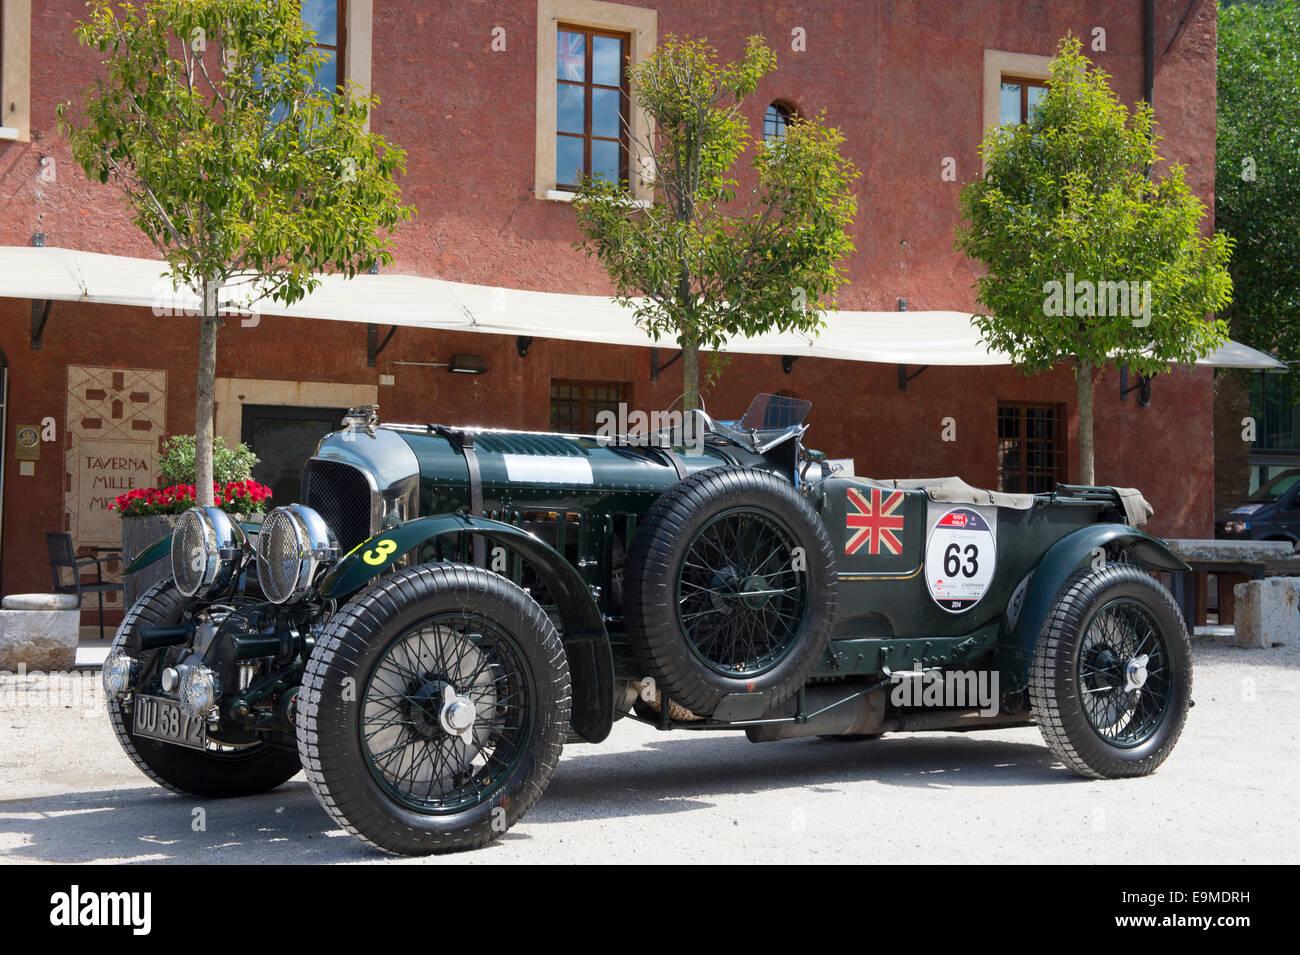 Bentley 4.5 Litre SC, built in 1930, Mille Miglia Museum, exhibition, classic car, race car, Mille Miglia car race, - Stock Image